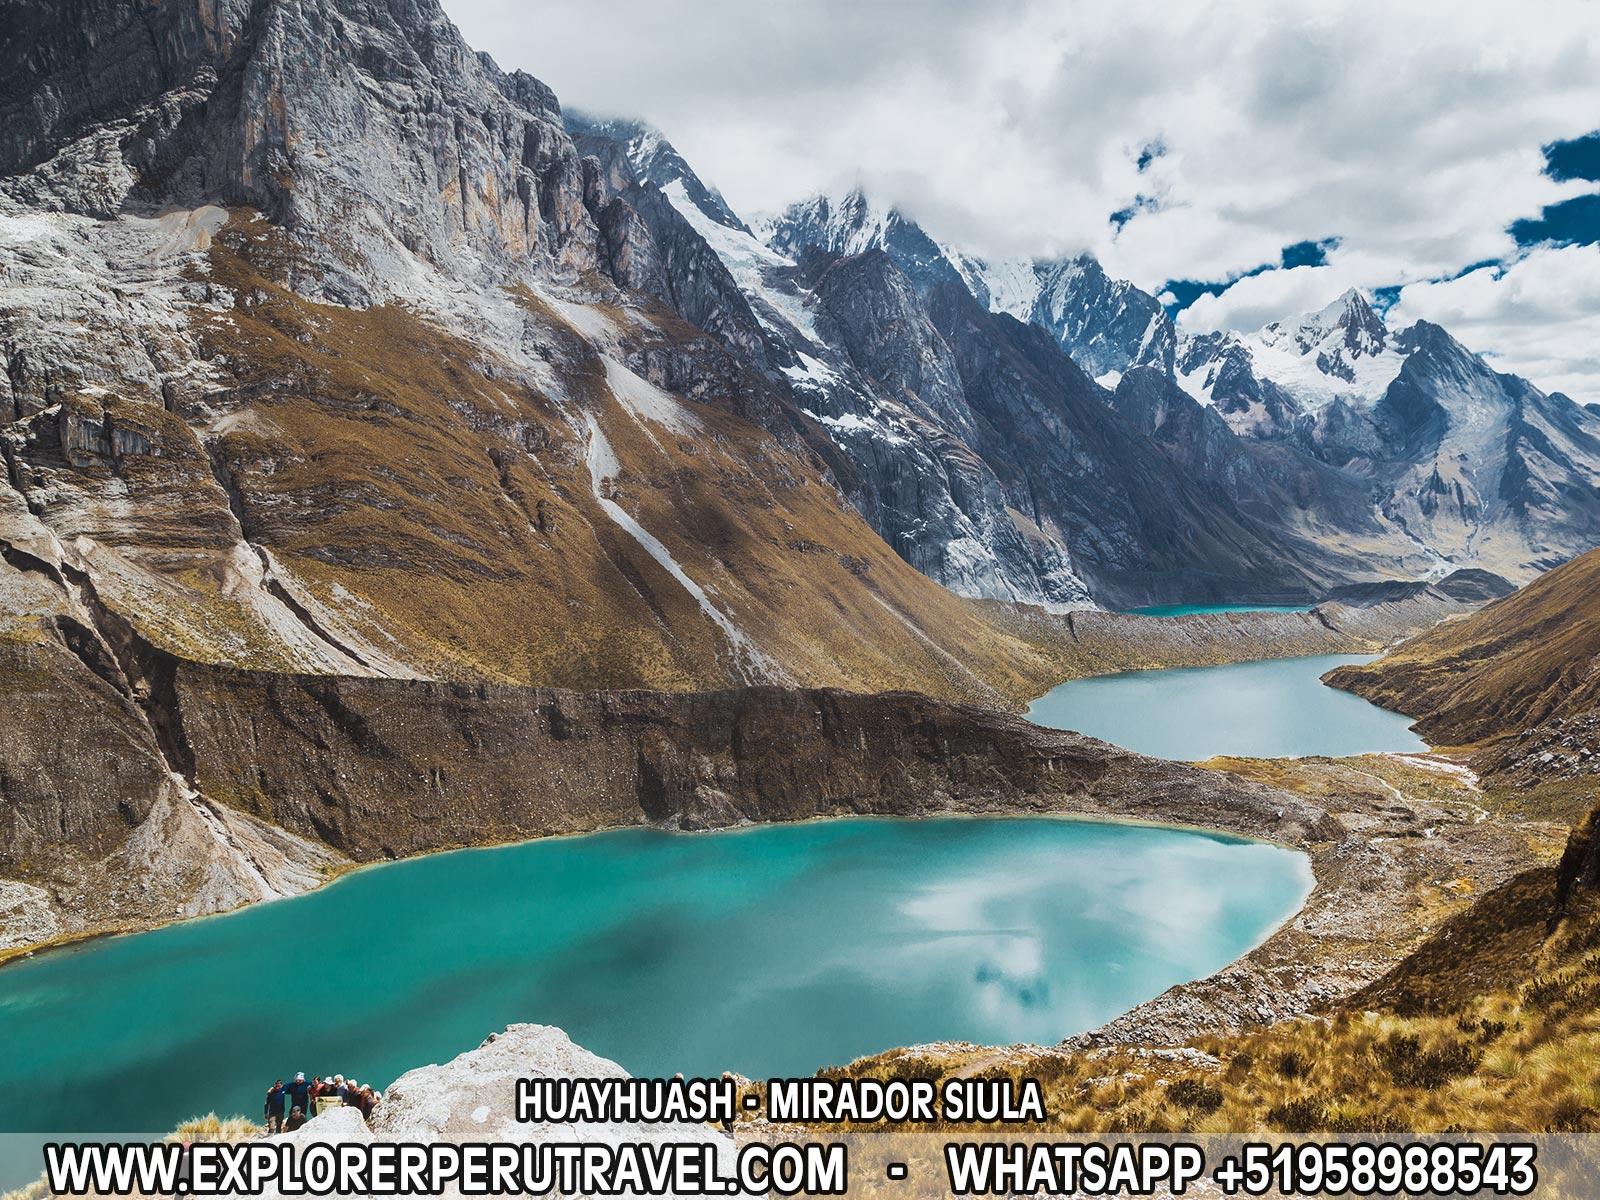 CORDILLERA DE HUAYHUASH - MIRADOR SIULA